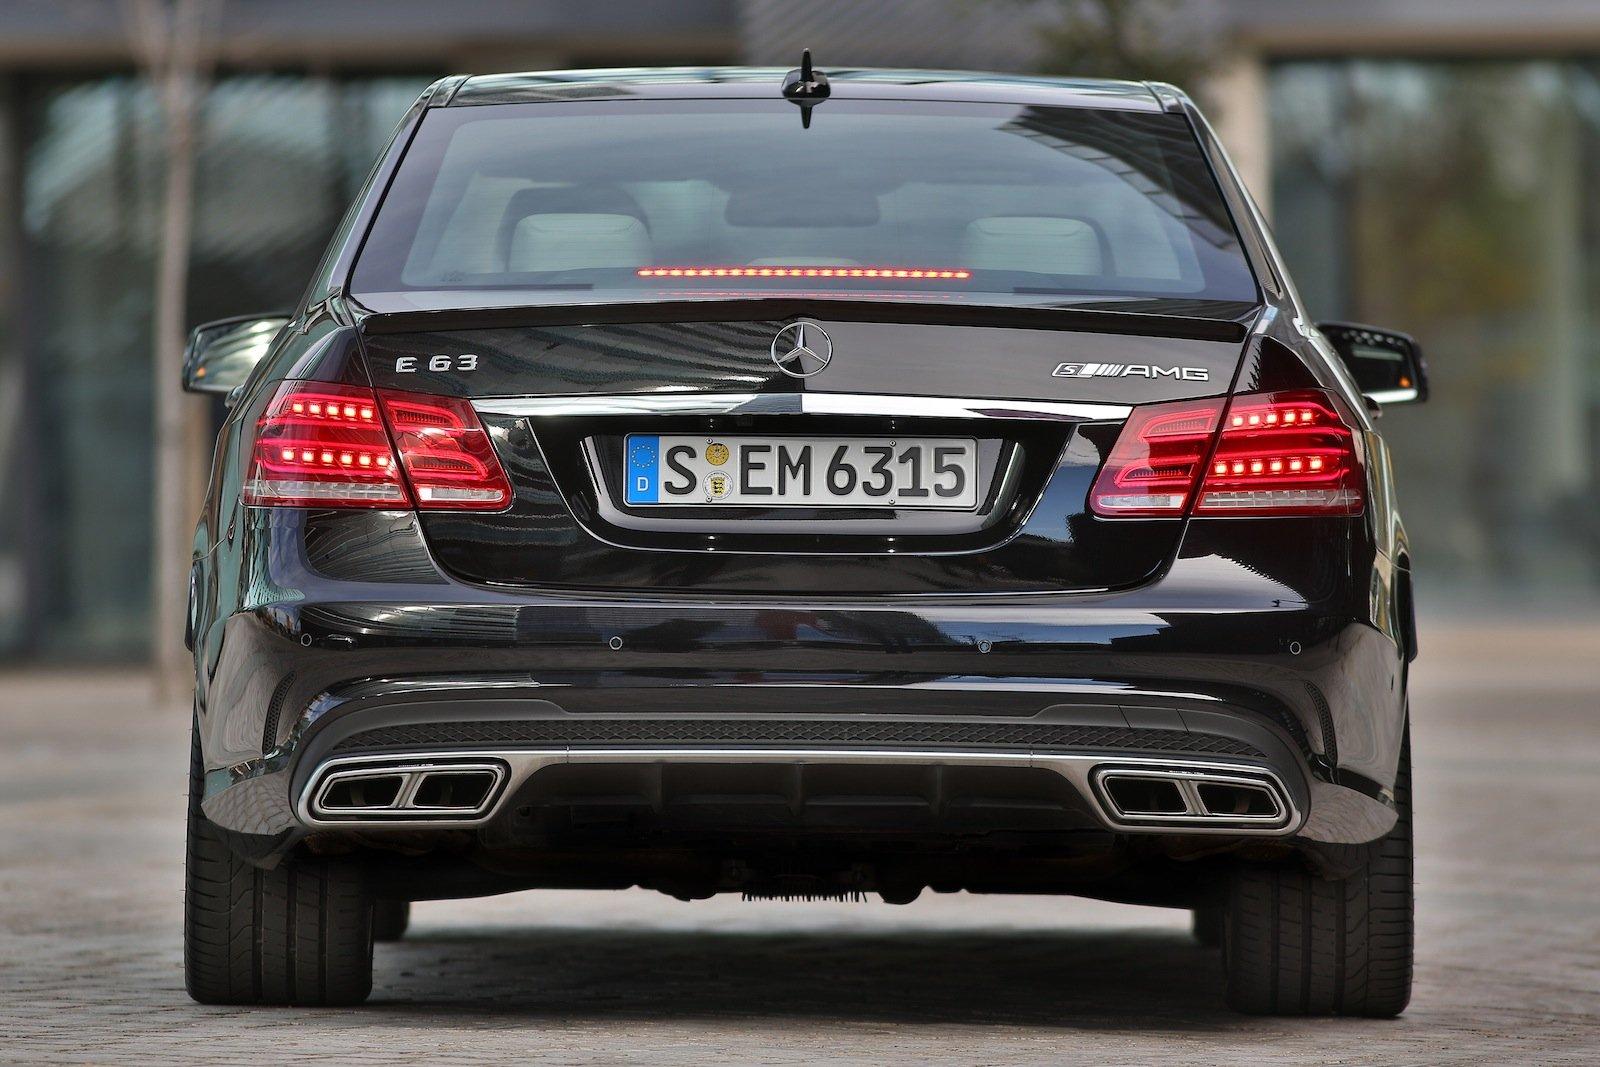 2013 mercedes benz e63 amg review caradvice for Mercedes benz of marion